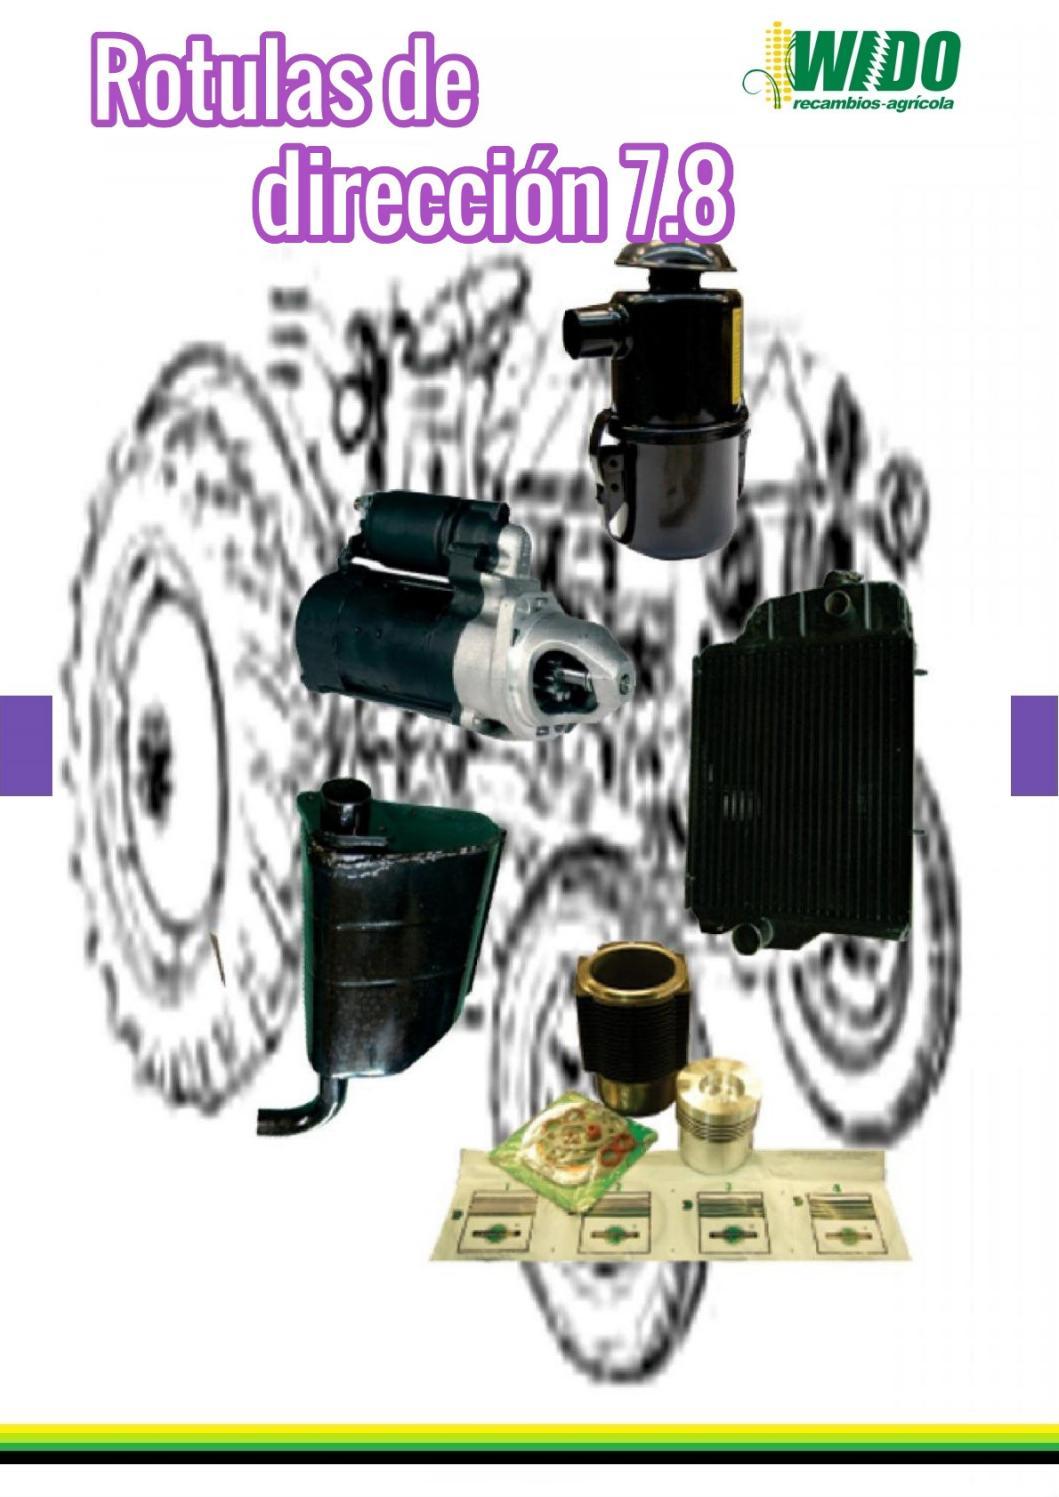 3428955M1 Landini Tractor Rotula Ref